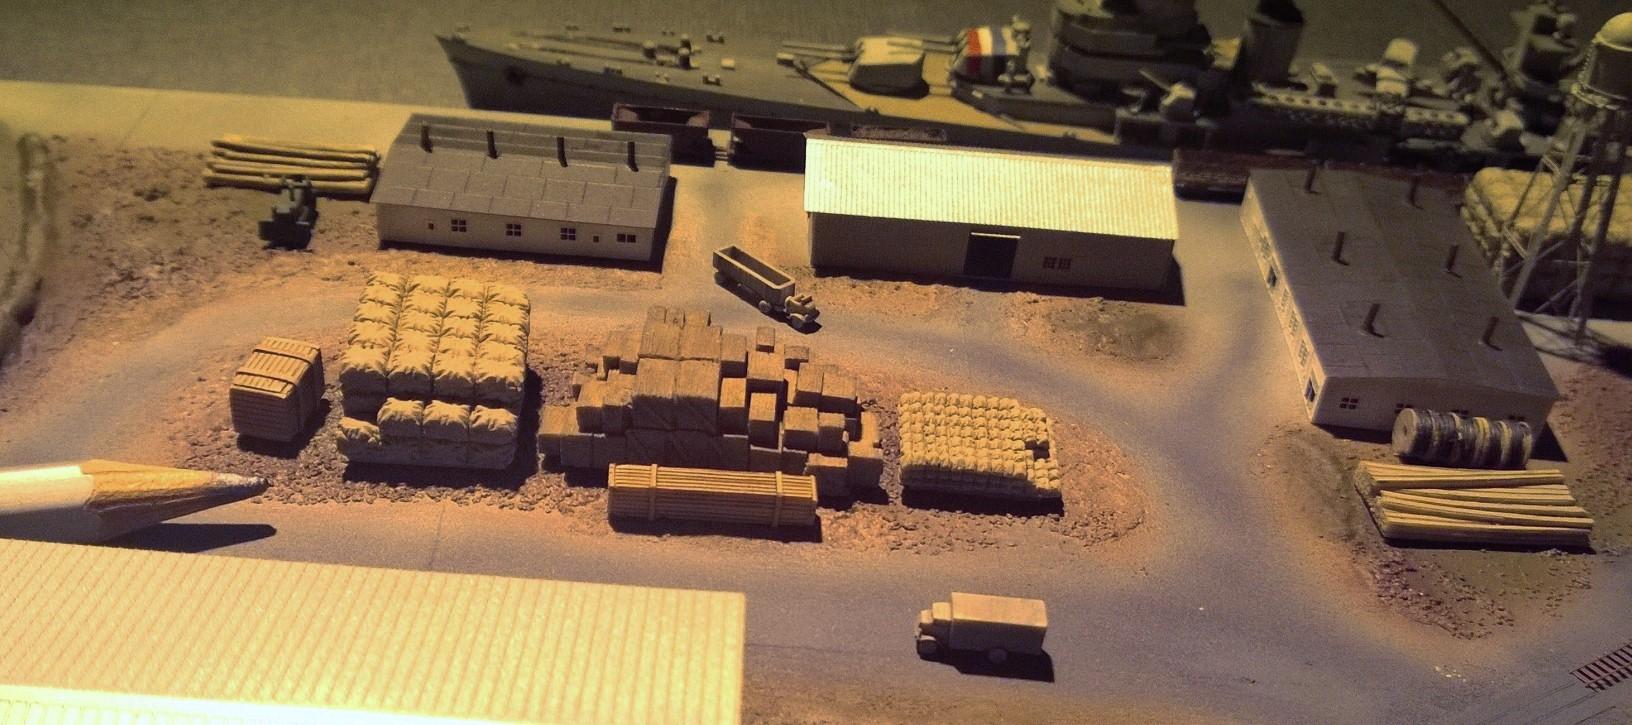 Diorama base navale 1/700 par Nesquik - Page 4 P3dEGhHY2